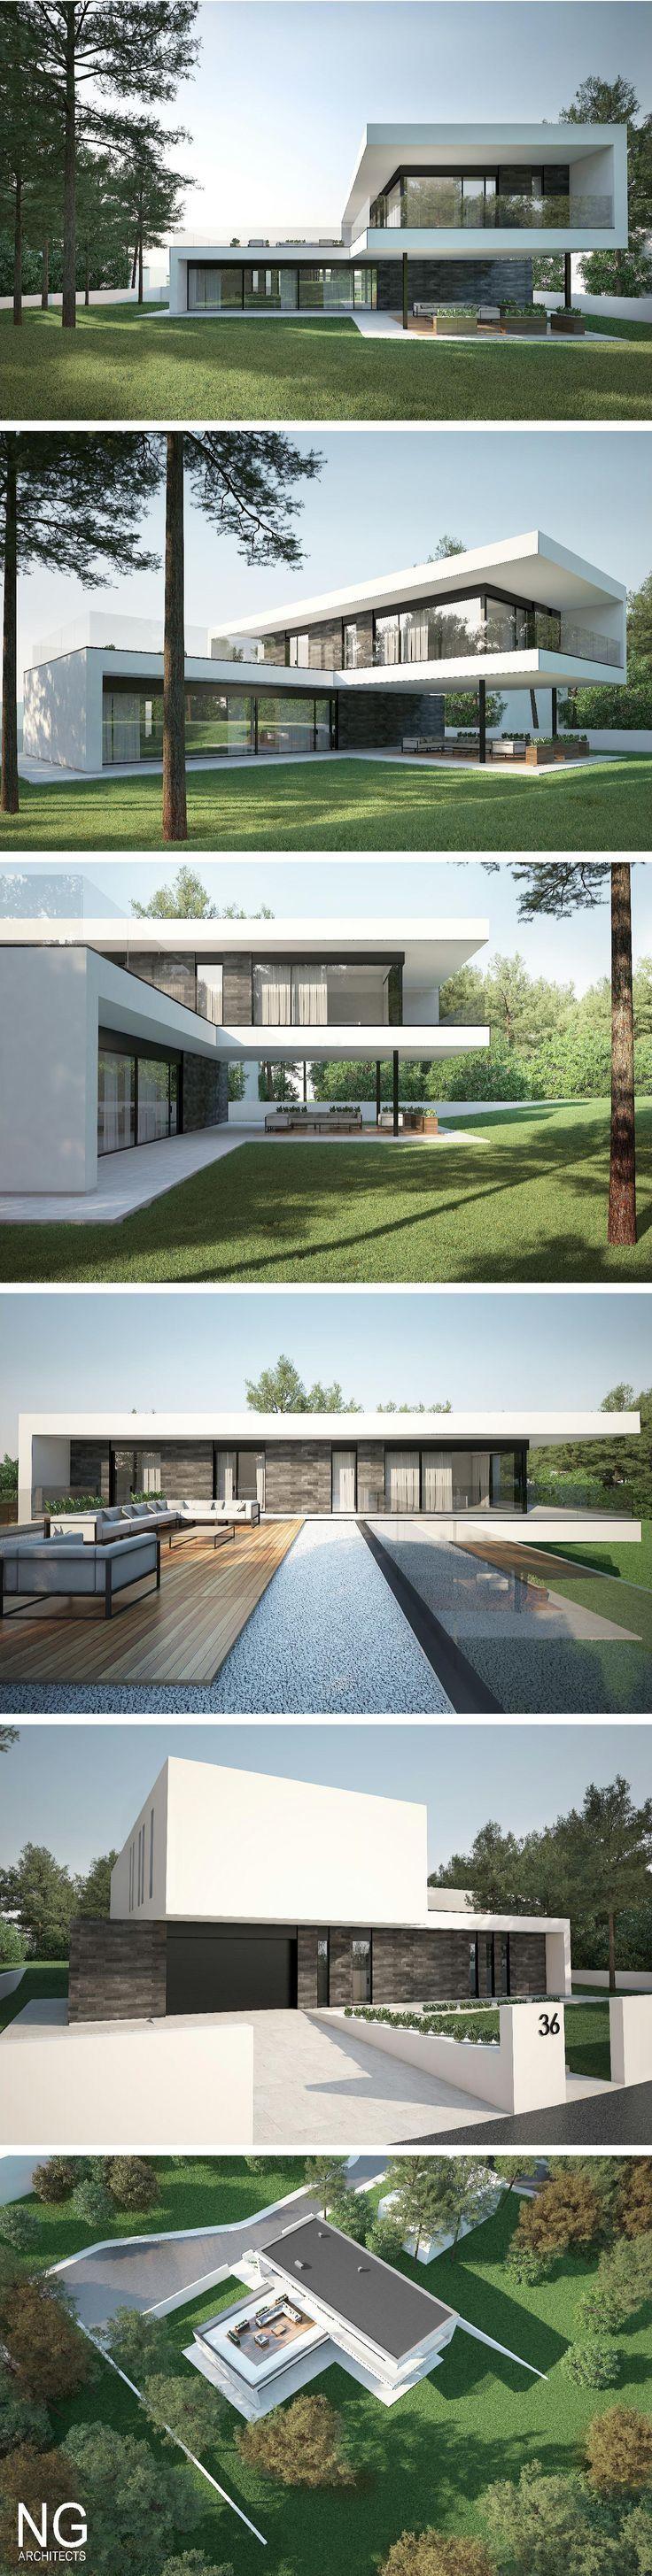 Modern Villa other views #modernhomedesignplans